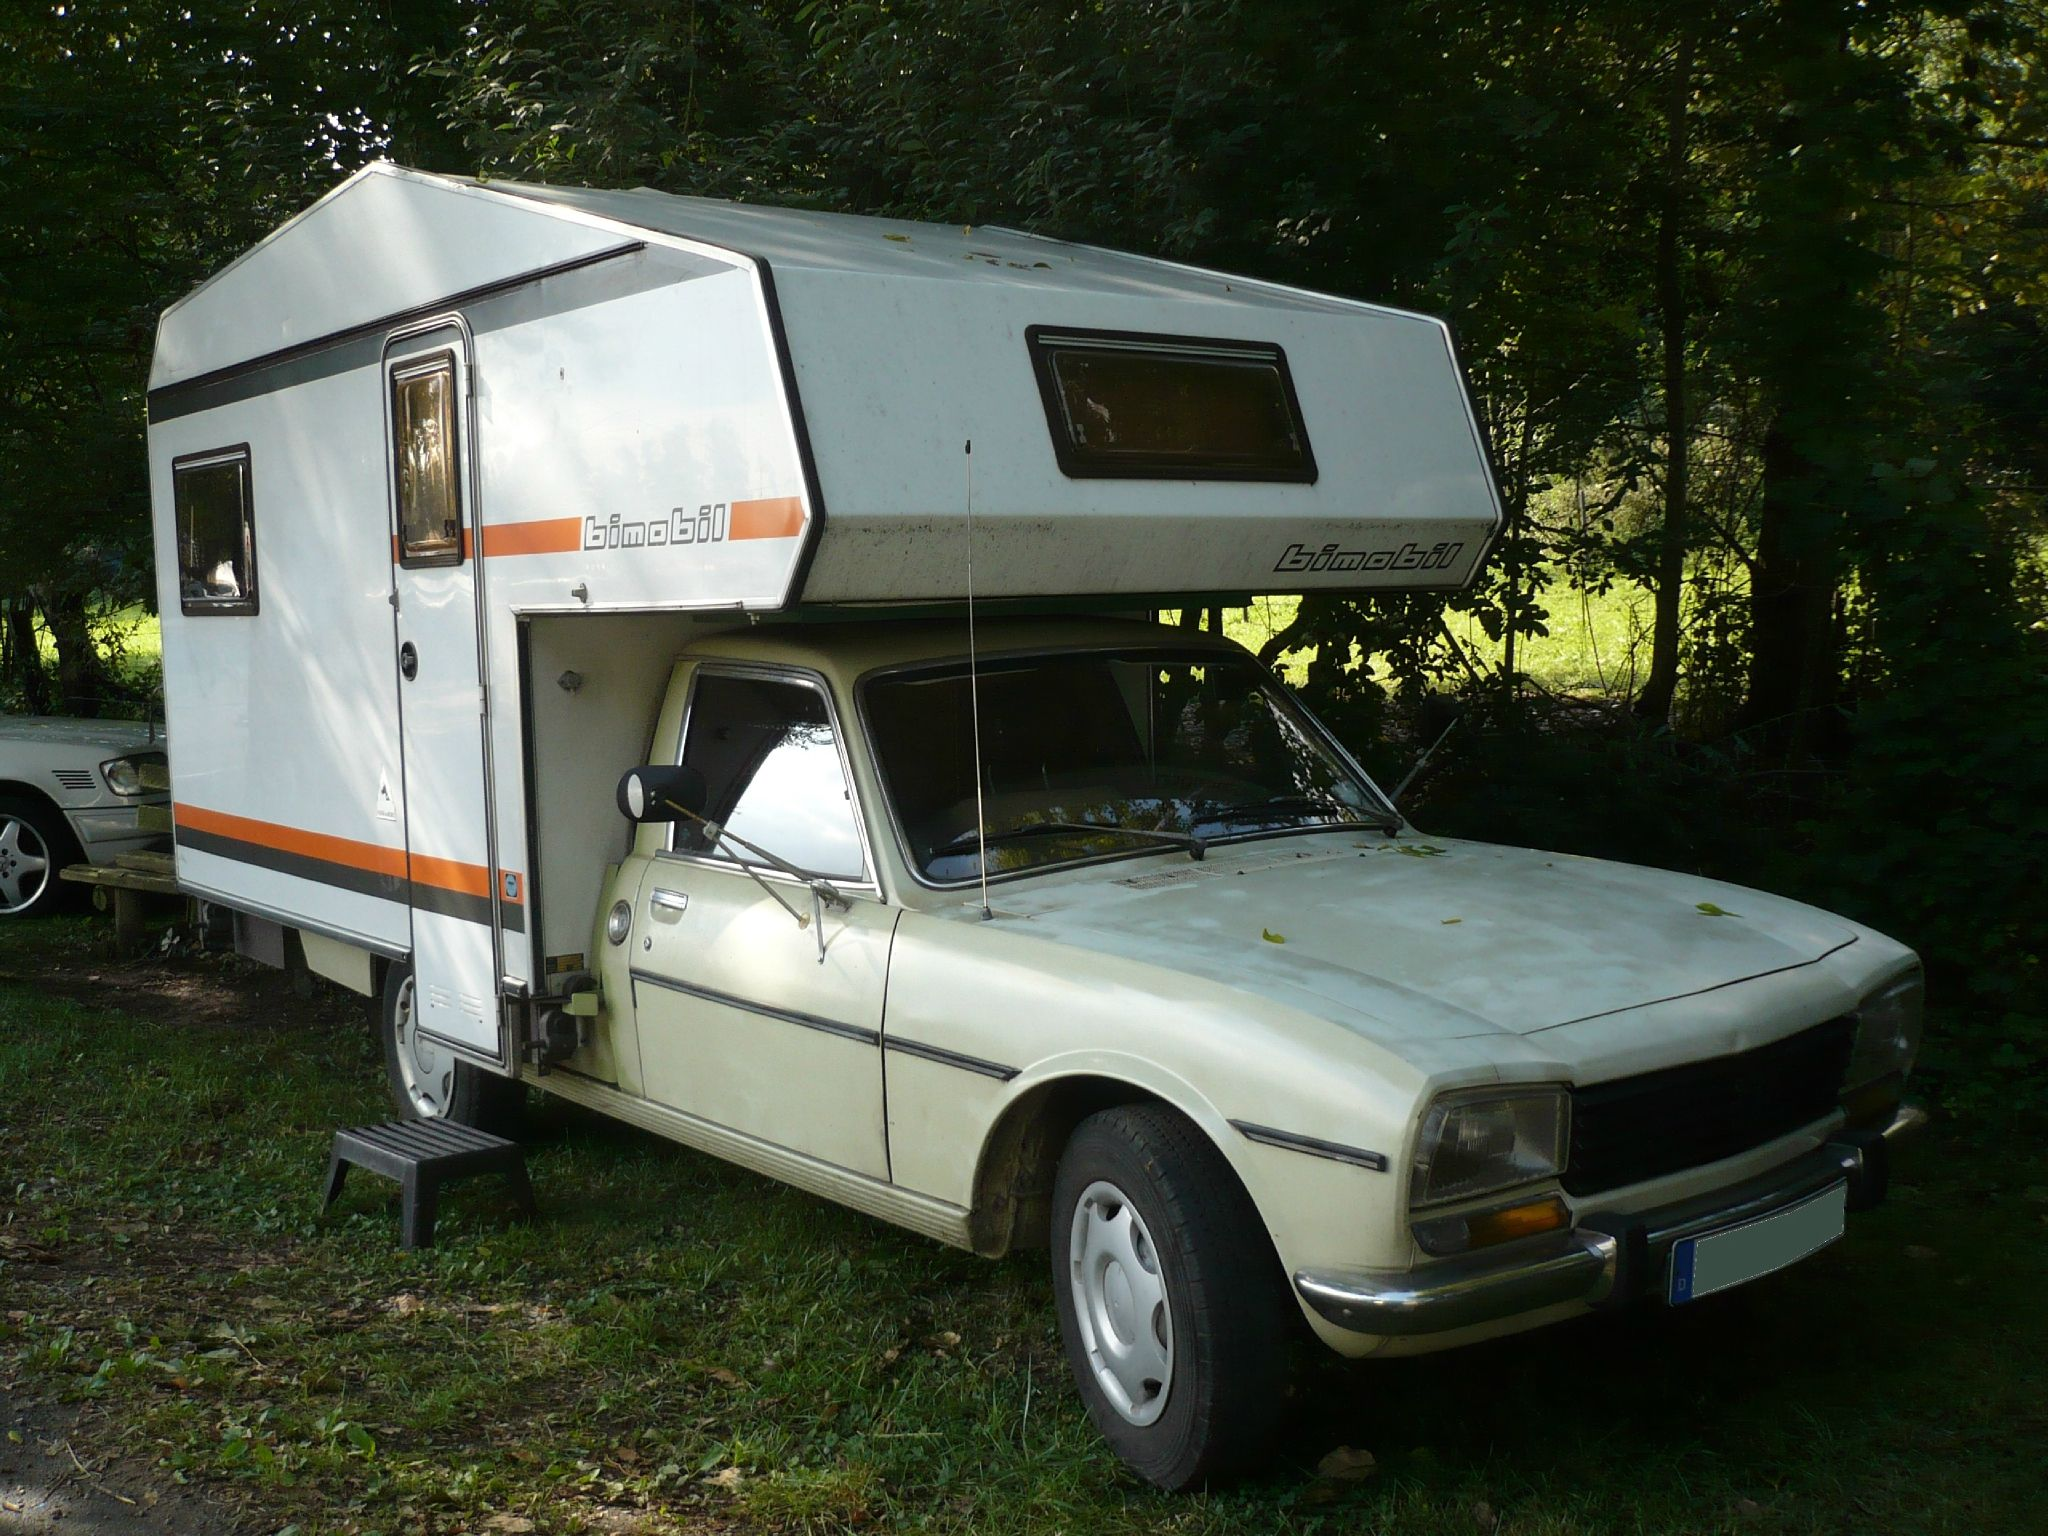 peugeot 504 camping car cellule bimobil homes pinterest peugeot cars and car photos. Black Bedroom Furniture Sets. Home Design Ideas